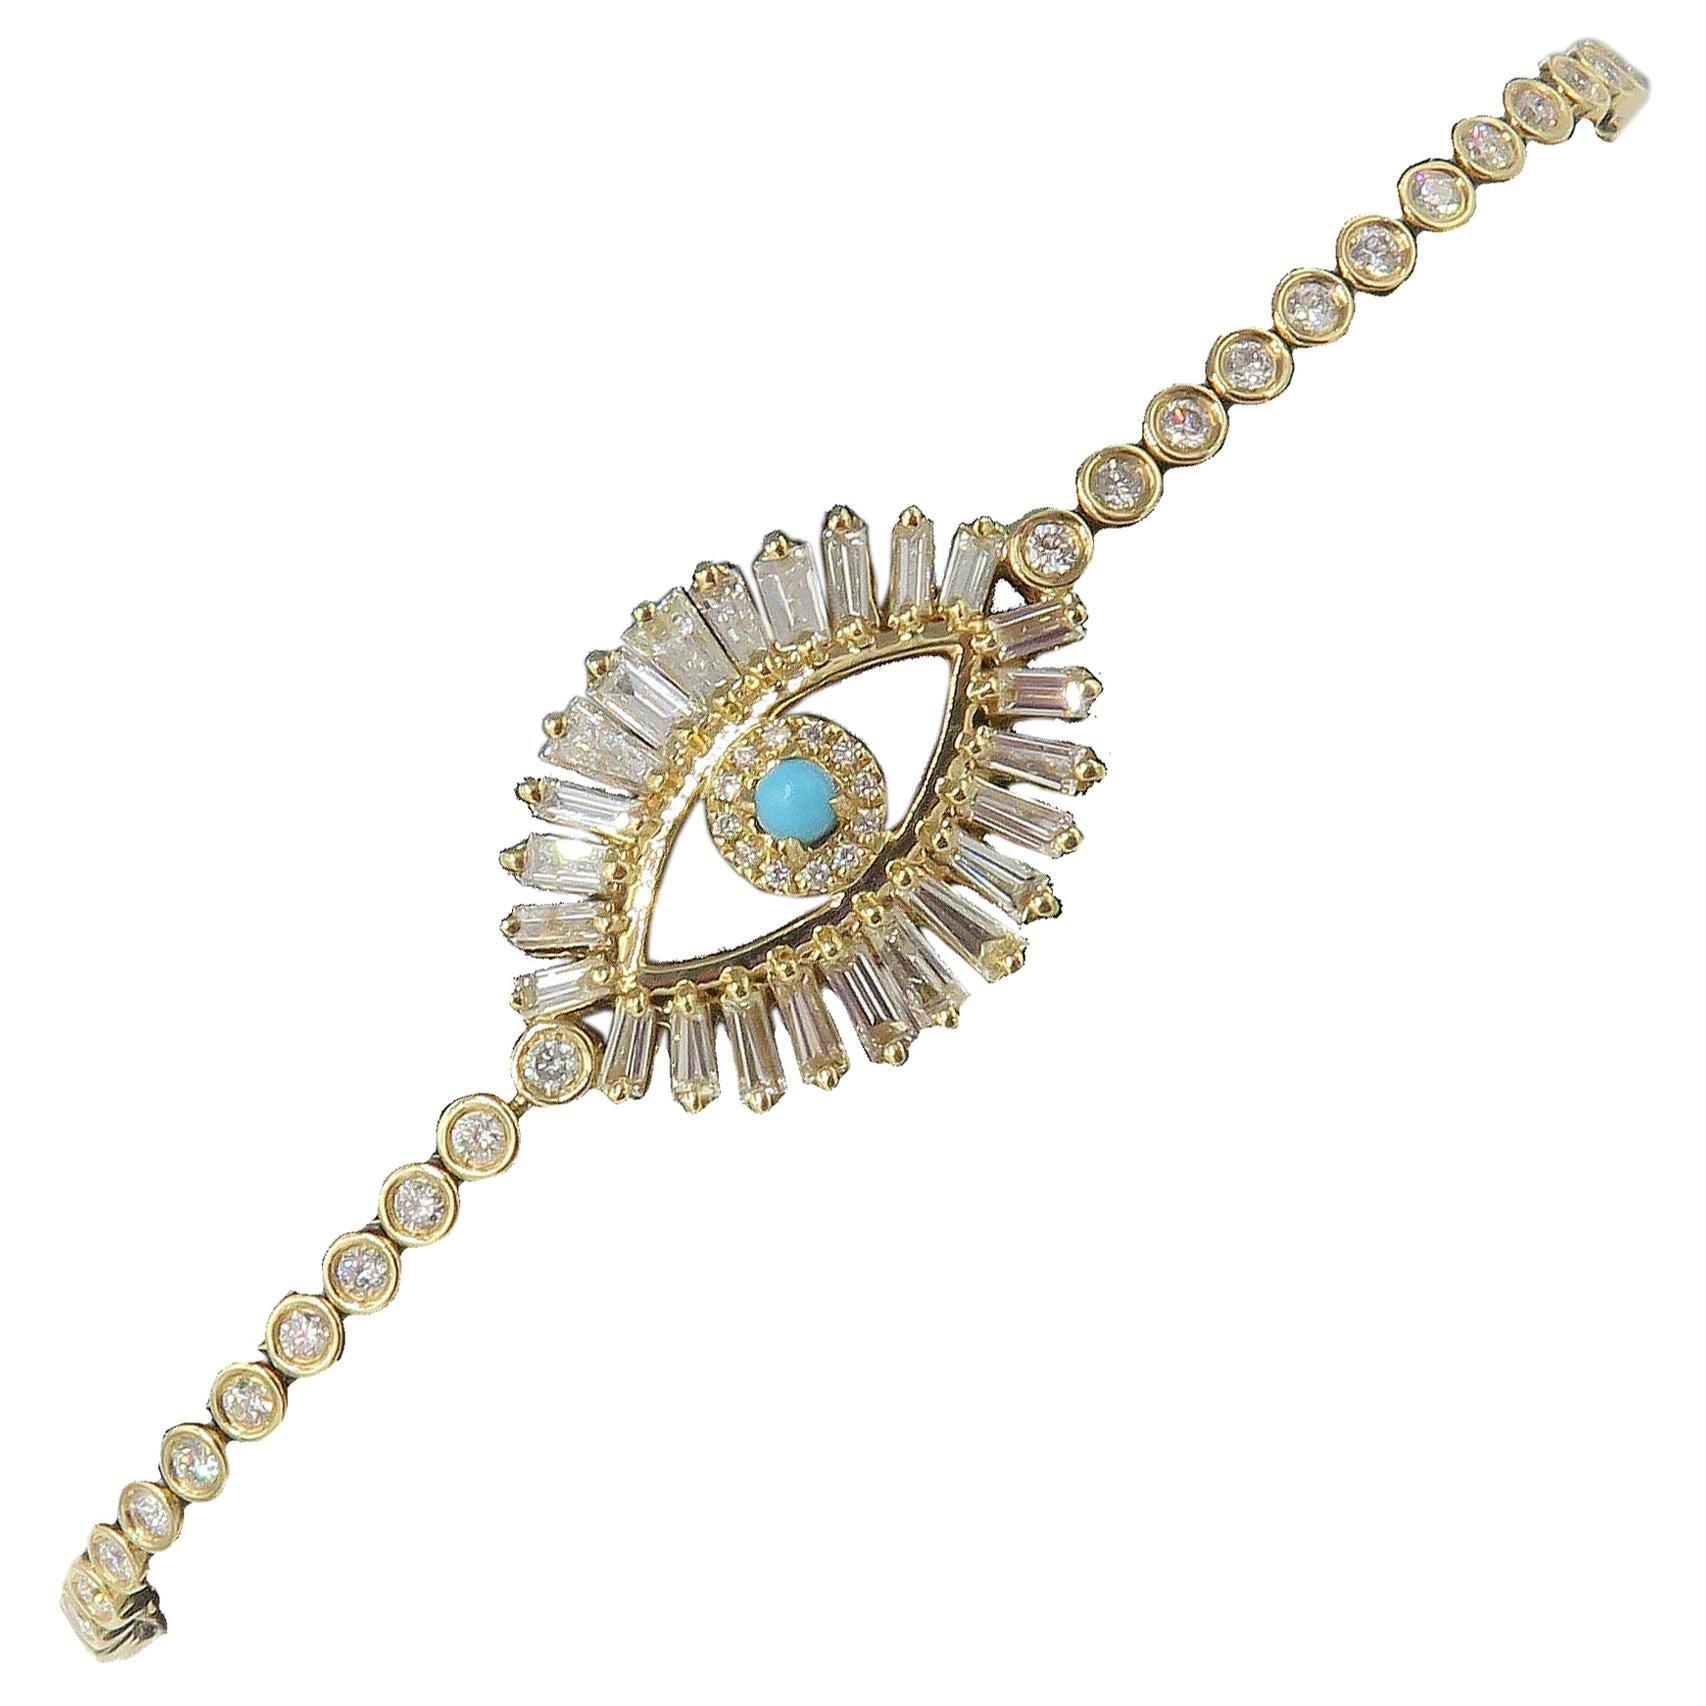 18 Karat Yellow Gold Turquoise and Baguette Diamond Evil Eye Tennis Bracelet